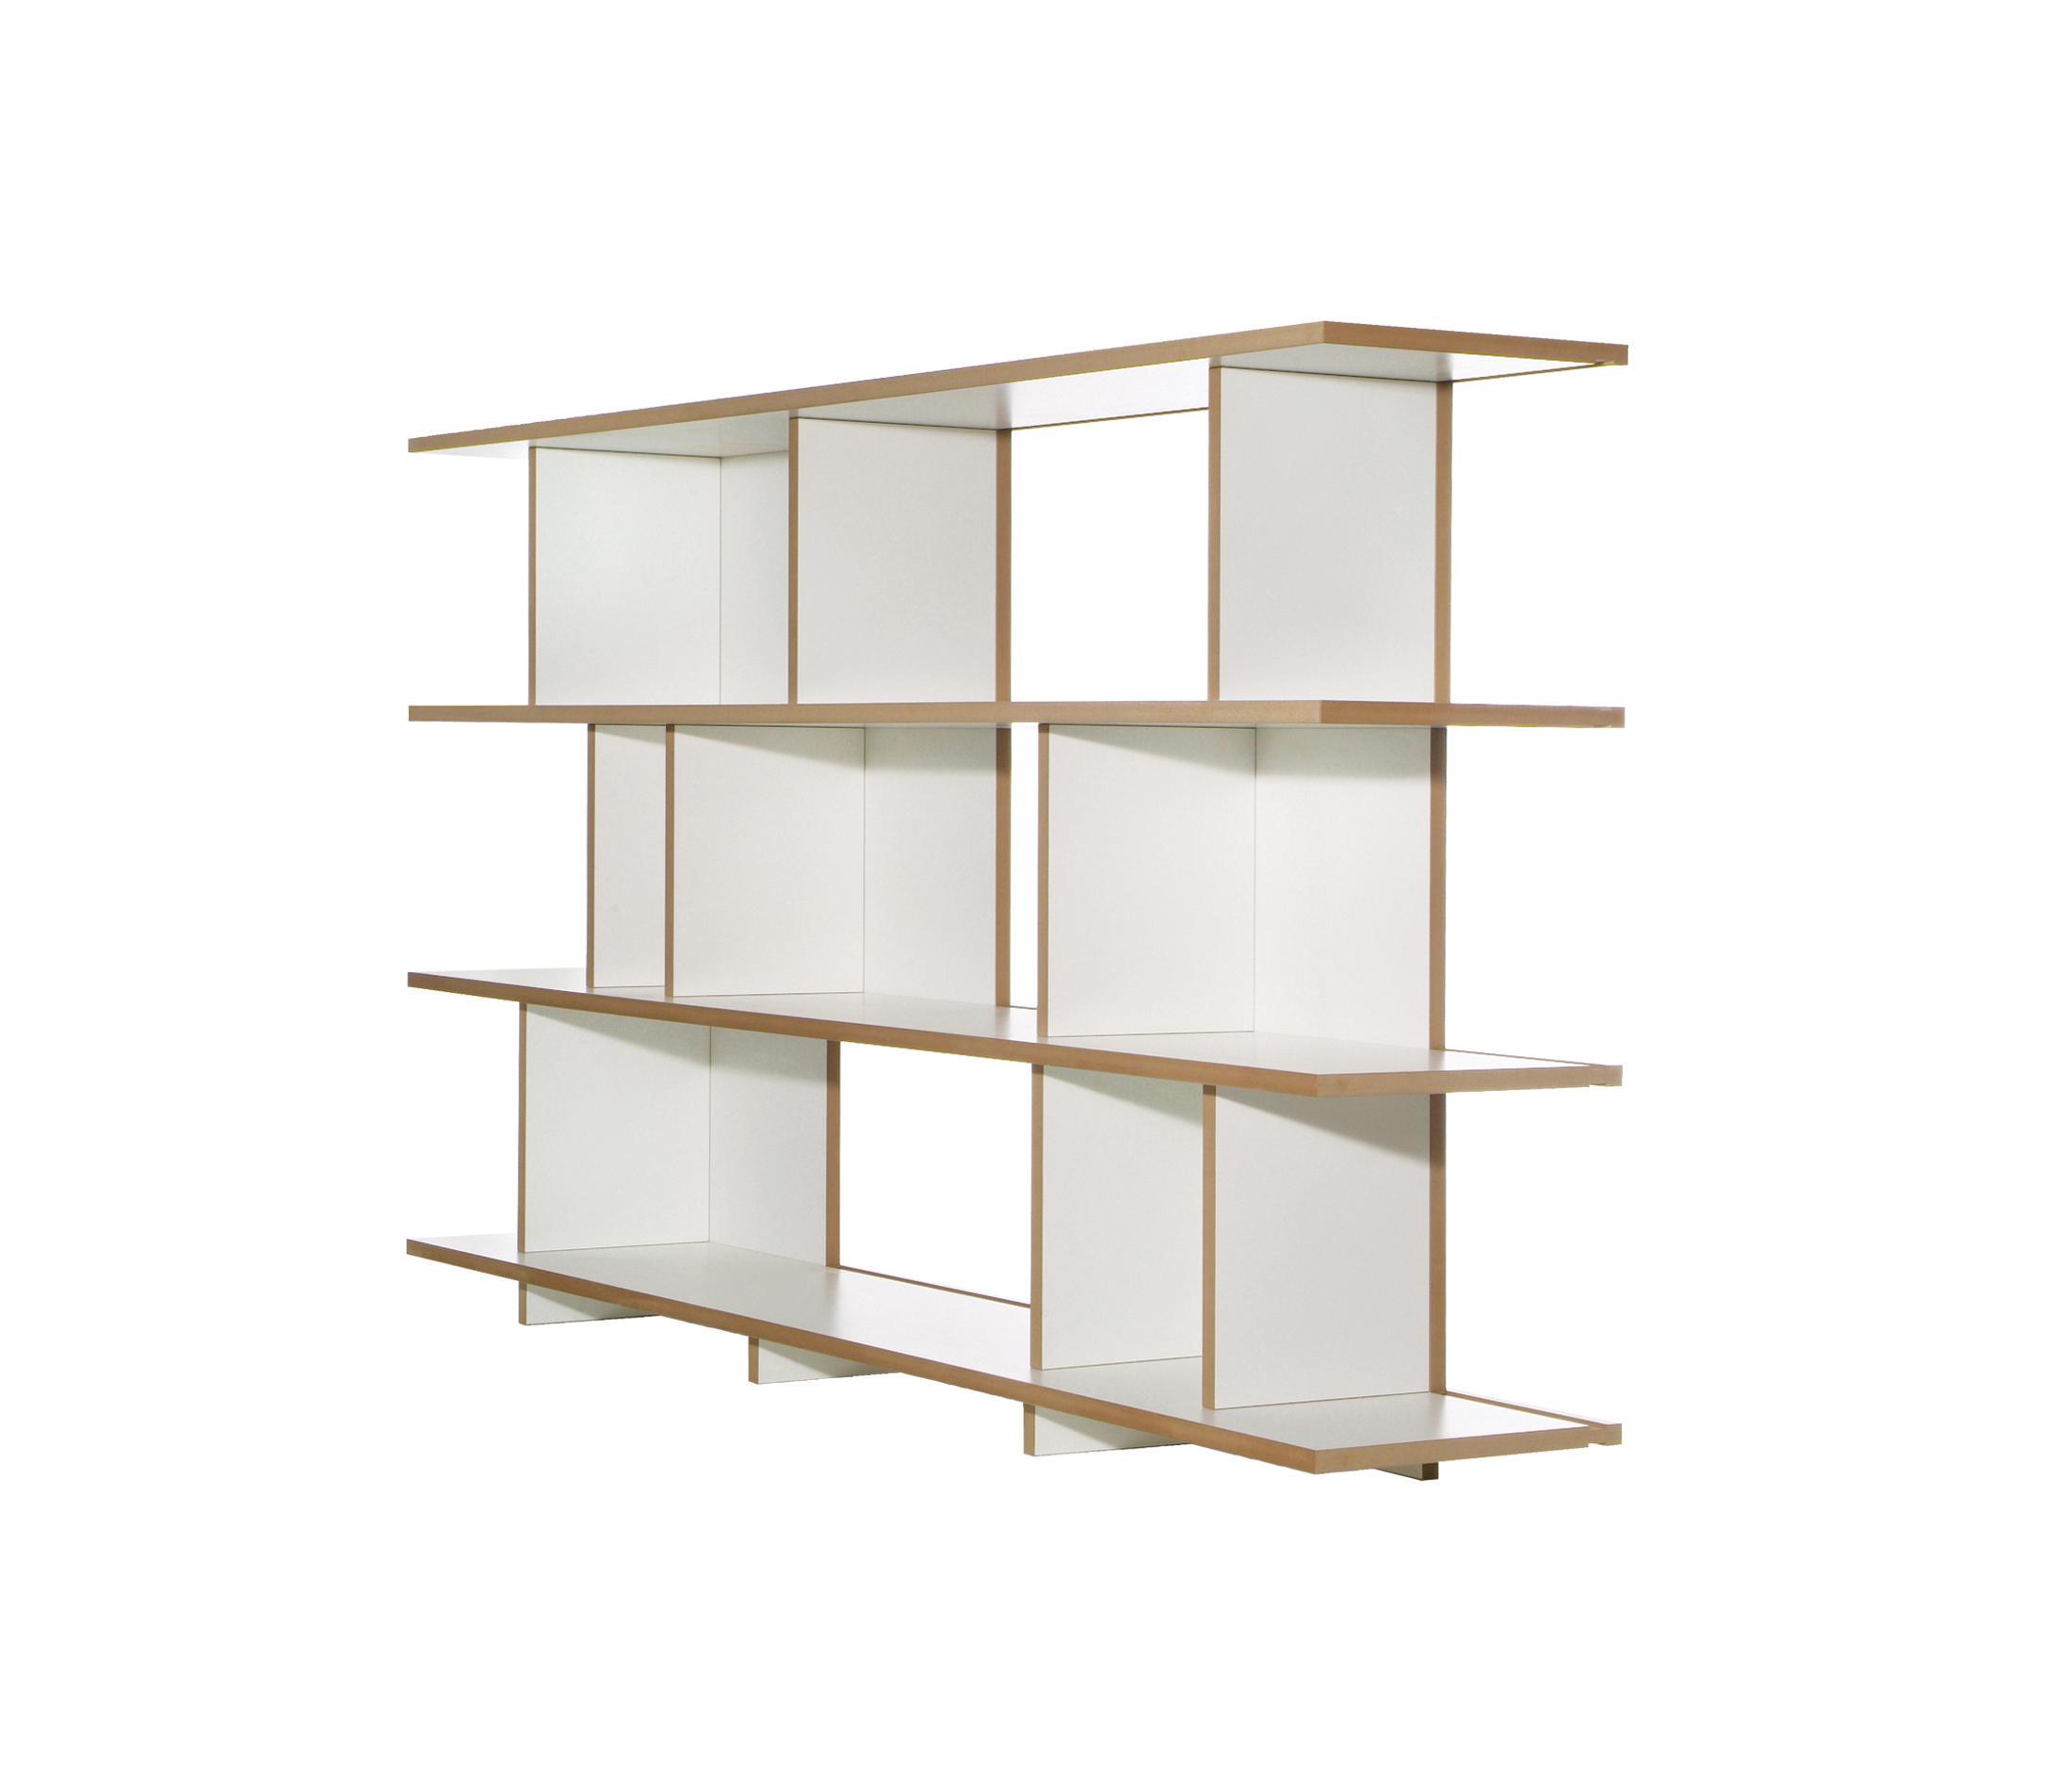 tojo stell sistemas de estanter a de tojo m bel architonic. Black Bedroom Furniture Sets. Home Design Ideas